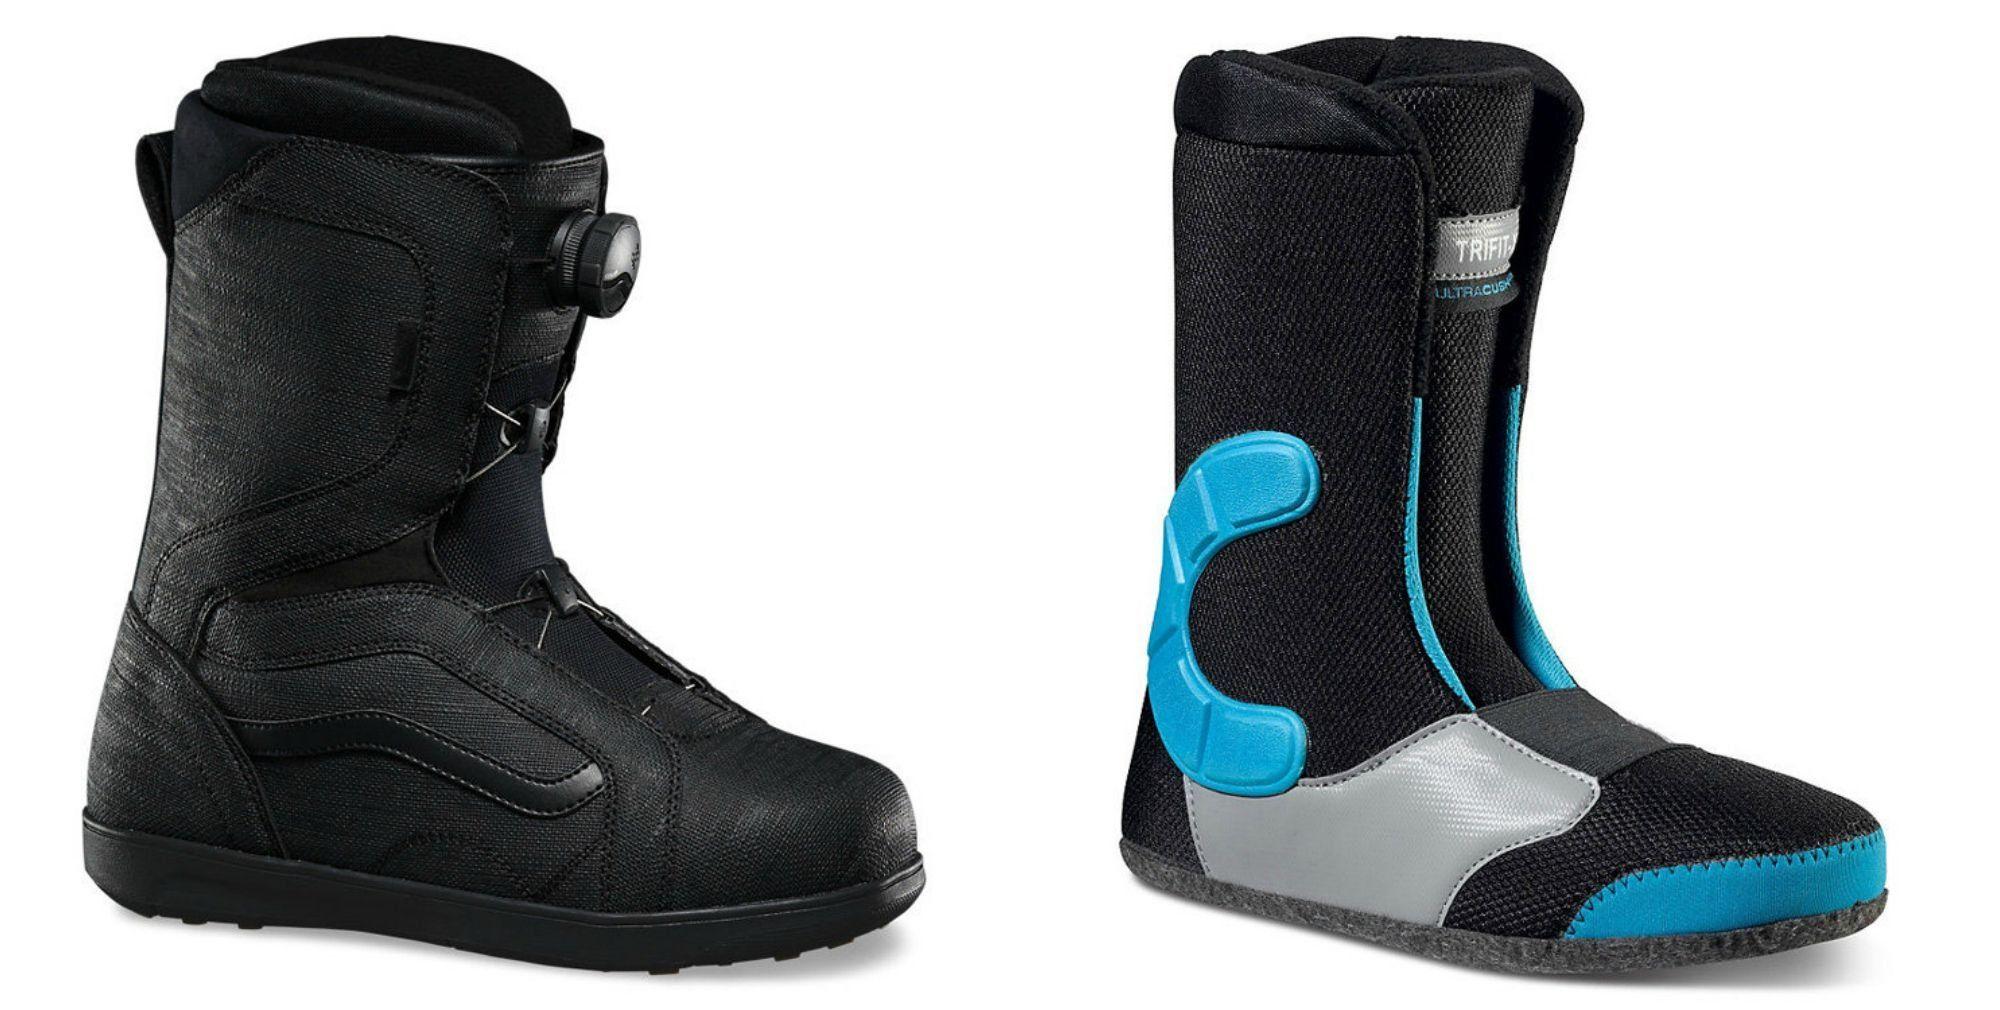 Рейтинг ботинок для сноуборда 2019